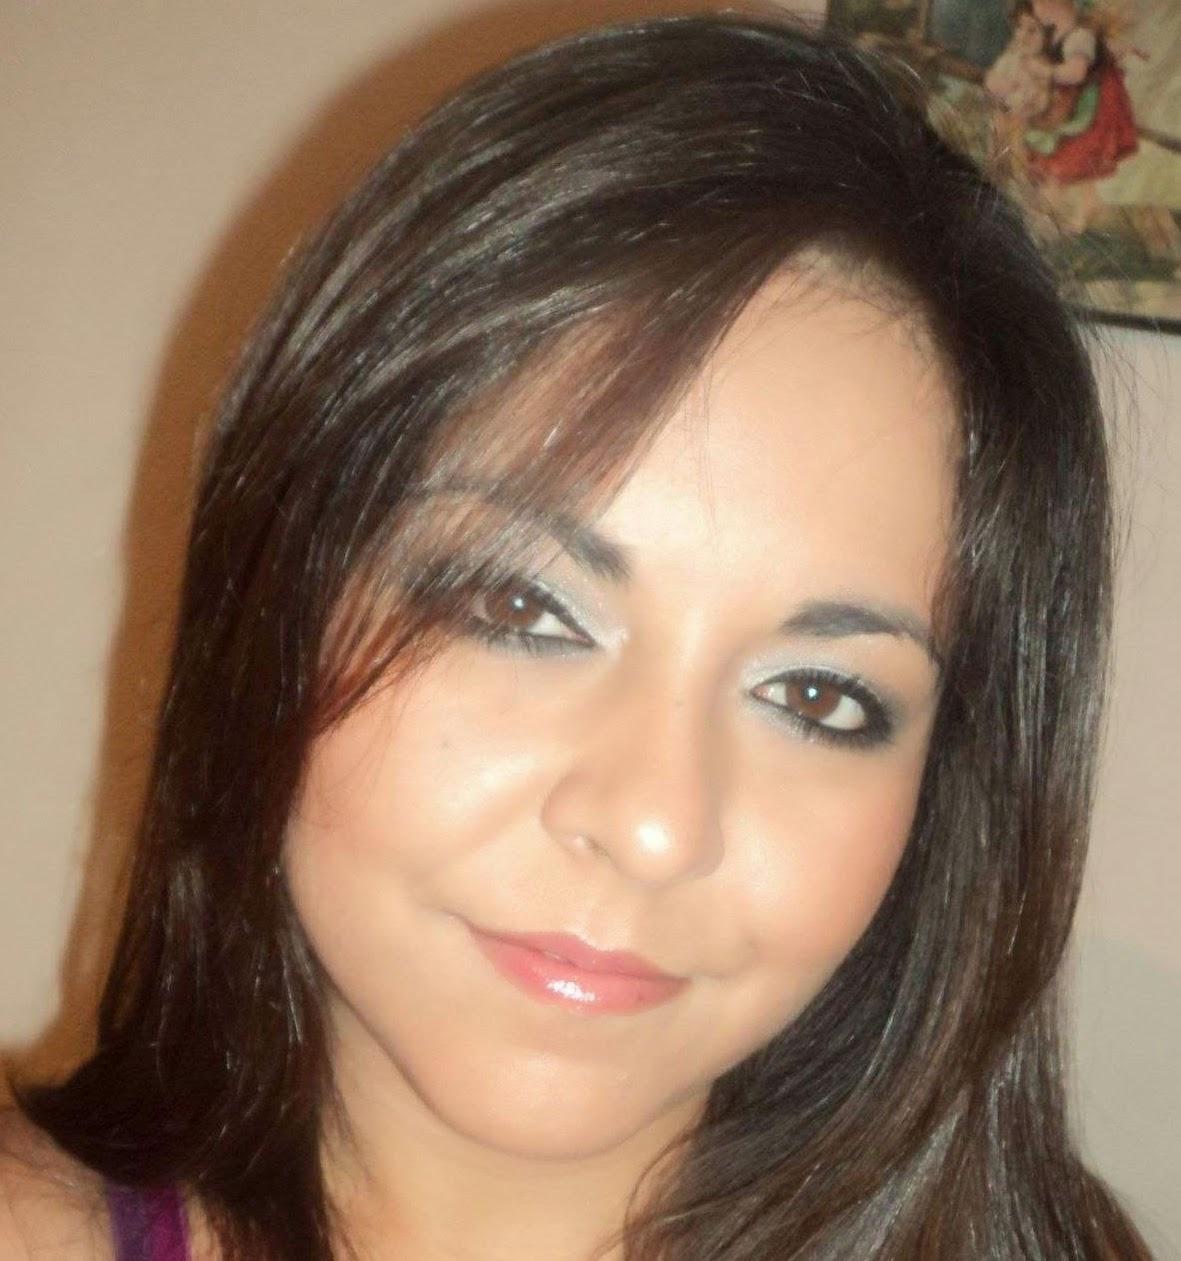 Mujeres egipcias solteras putas sexo Algeciras-58424